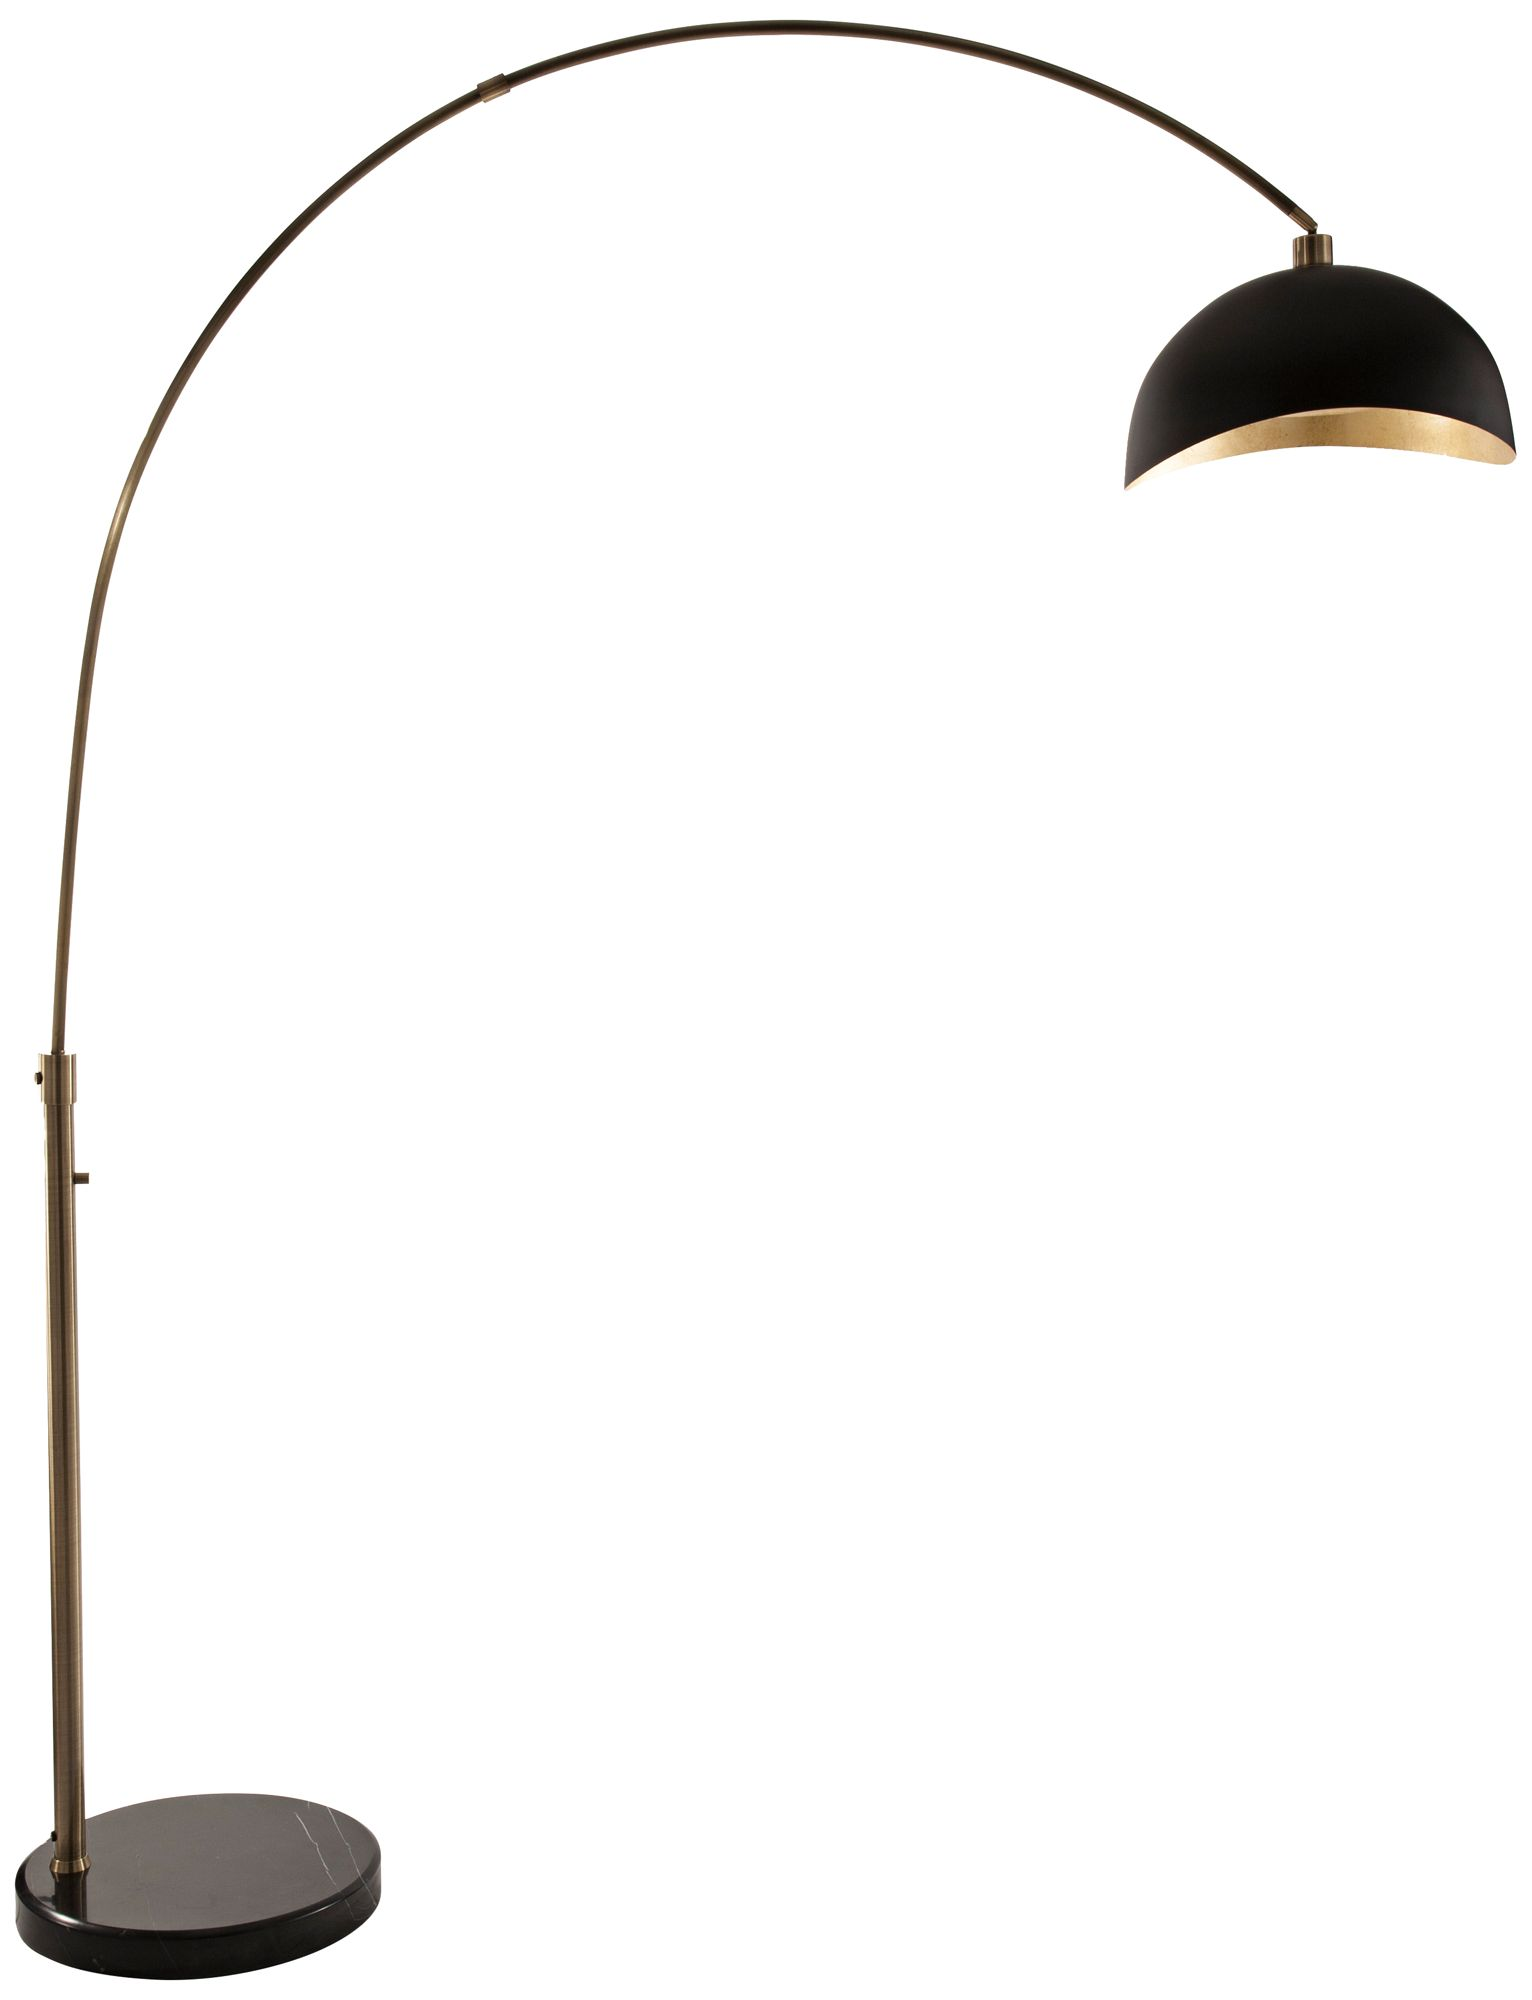 Delightful Nova Luna Bella Weathered Brass Arc Floor Lamp